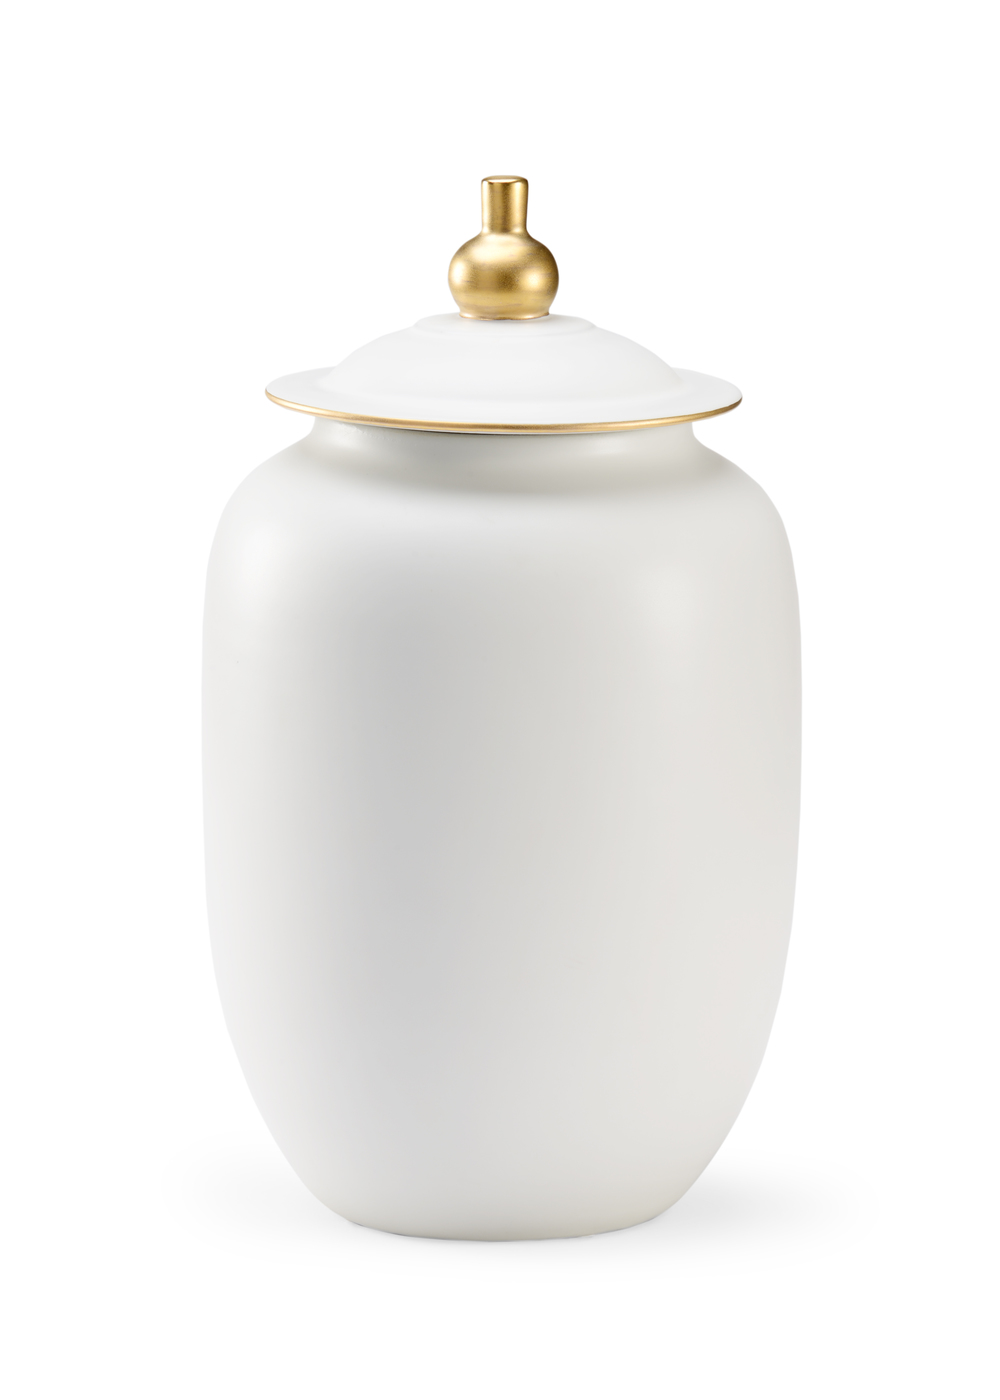 Chelsea House - Baohe Vase